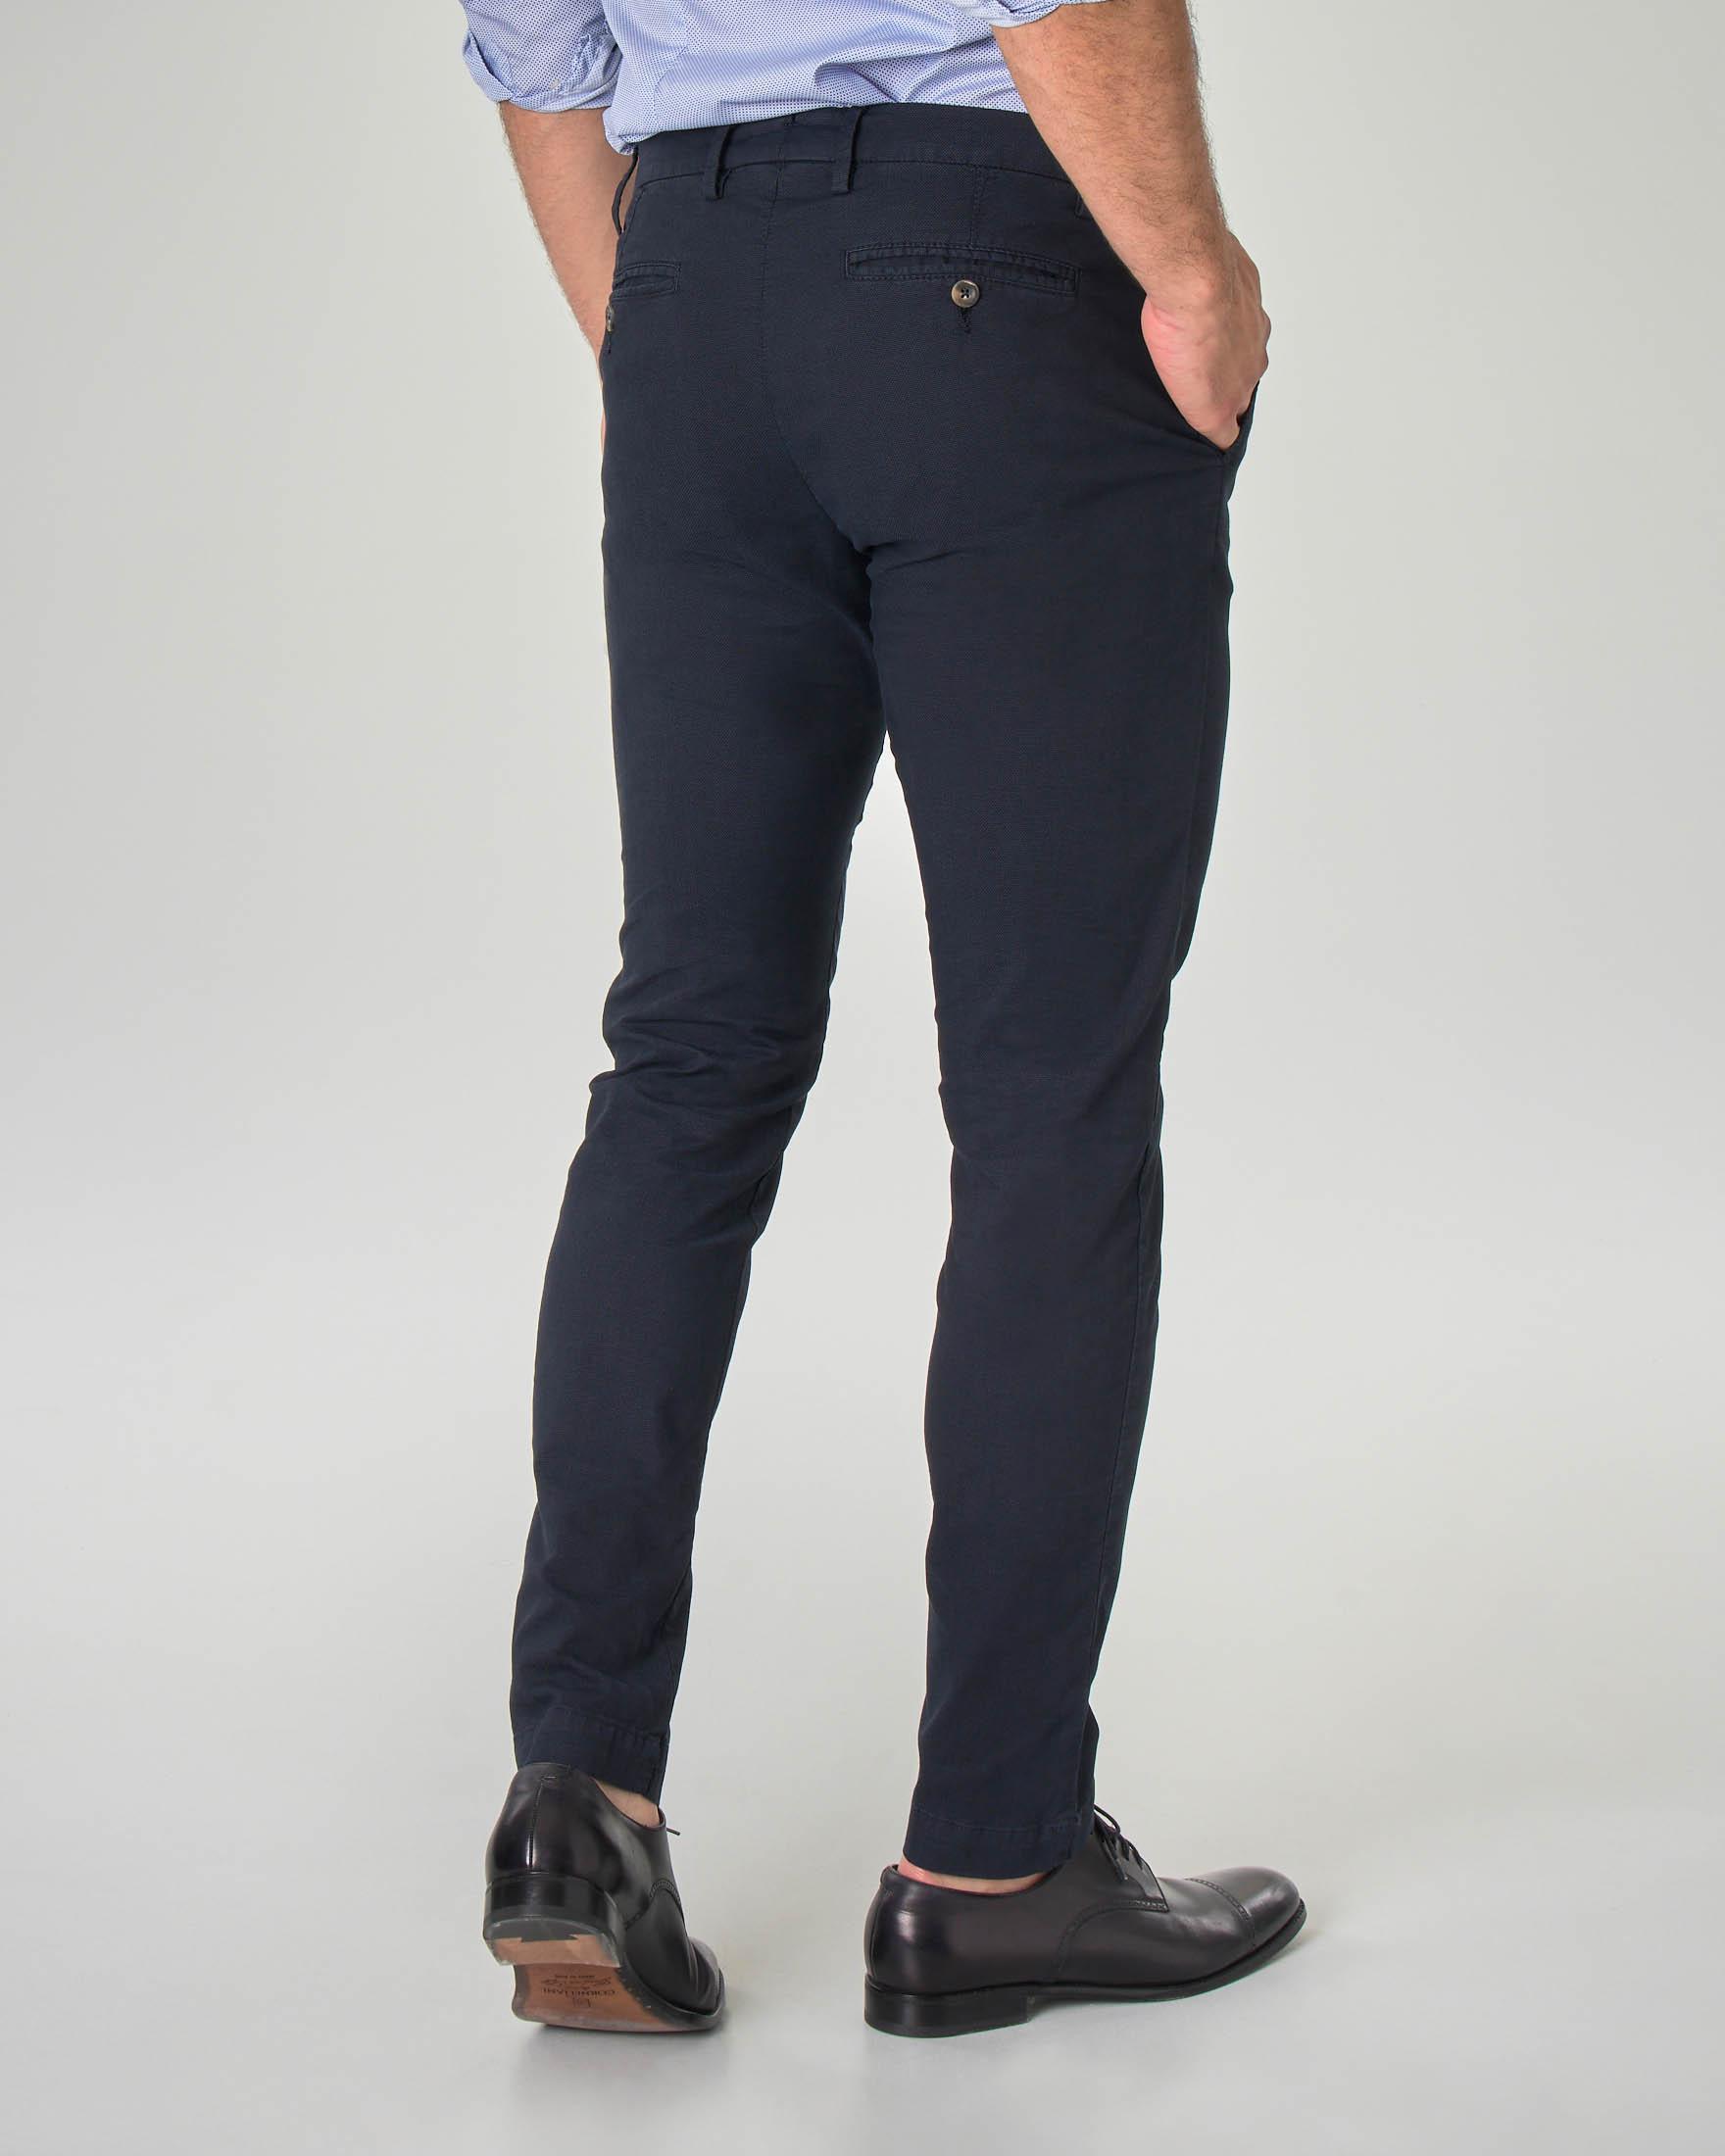 Pantalone chino blu scuro in tessuto puntaspillo stretch